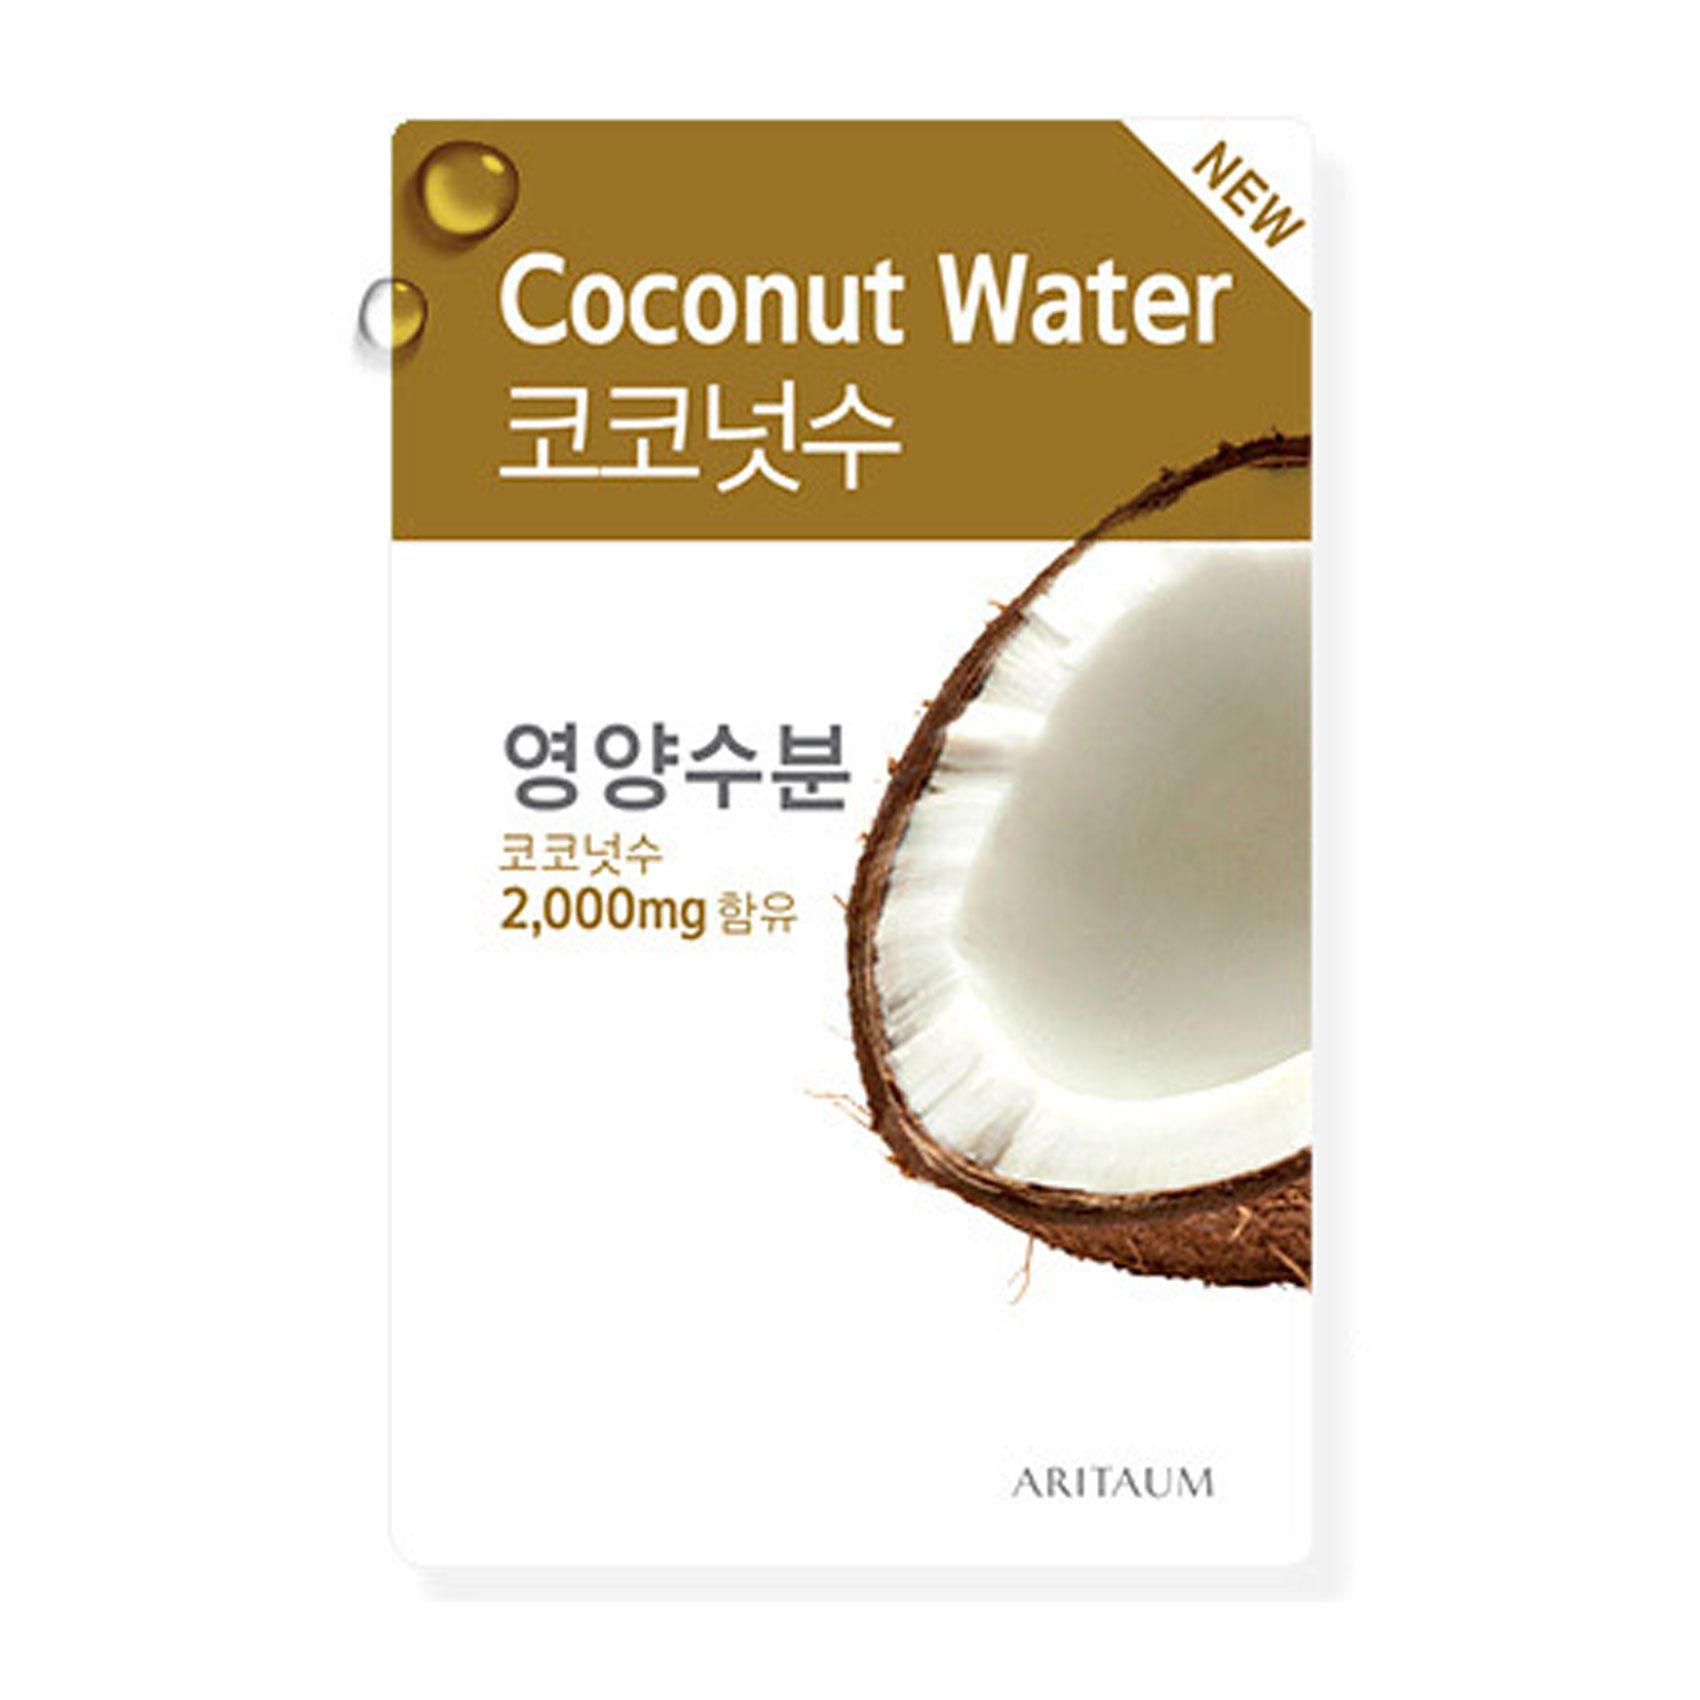 Aritaum Fresh Power Coconut Water Mask